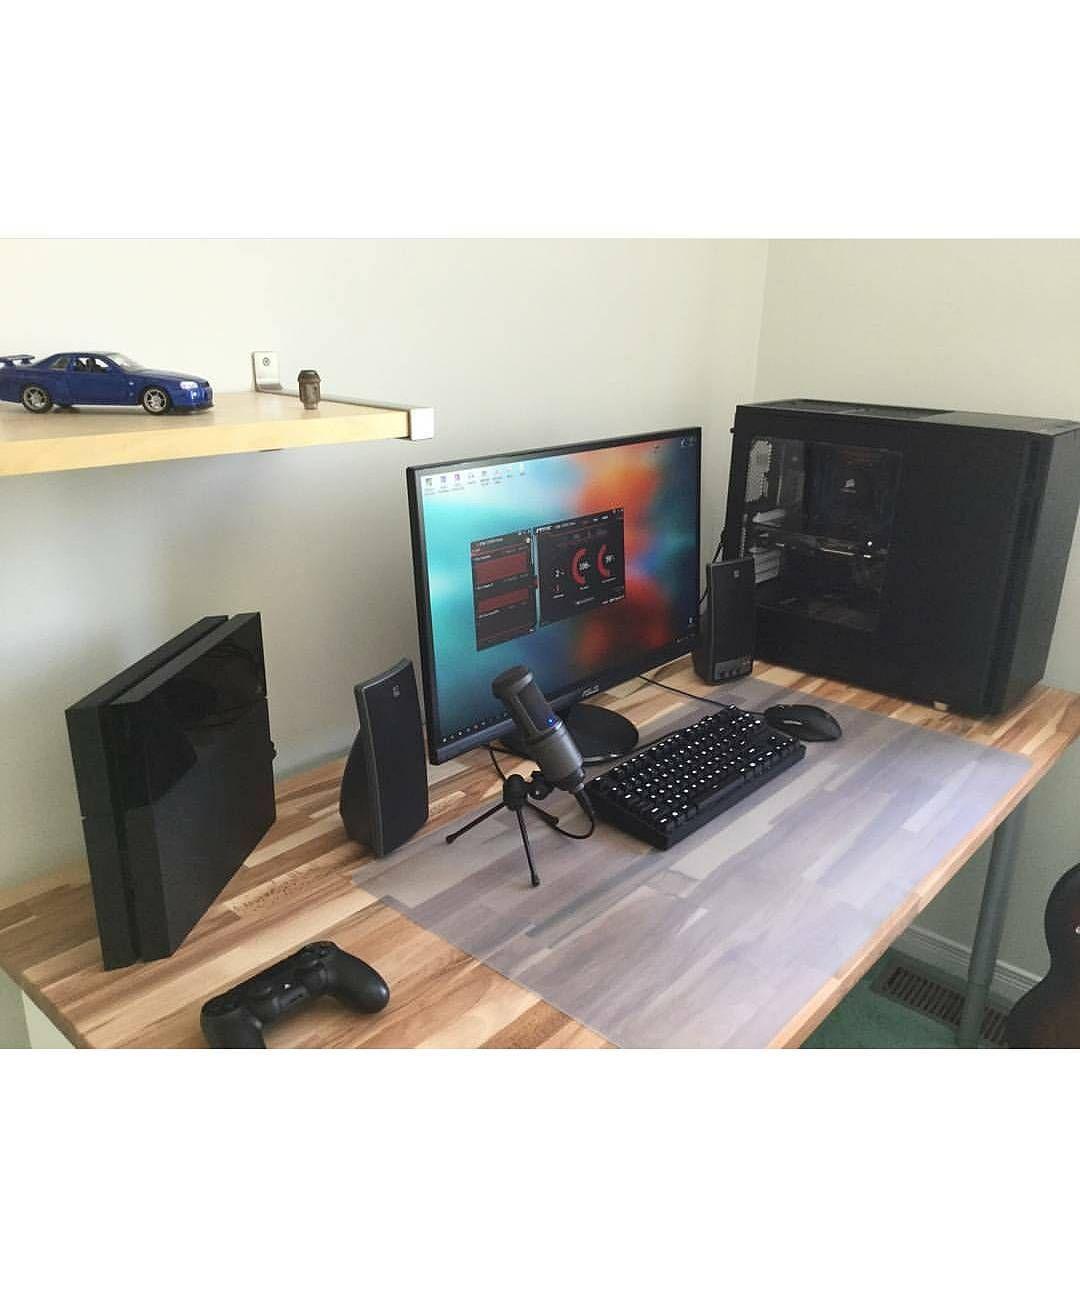 Here S A Sleek Setup Found From Bestgamingsetupz Besides The Cool Accessories Home Office Setup Computer Desk Setup Gaming Room Setup